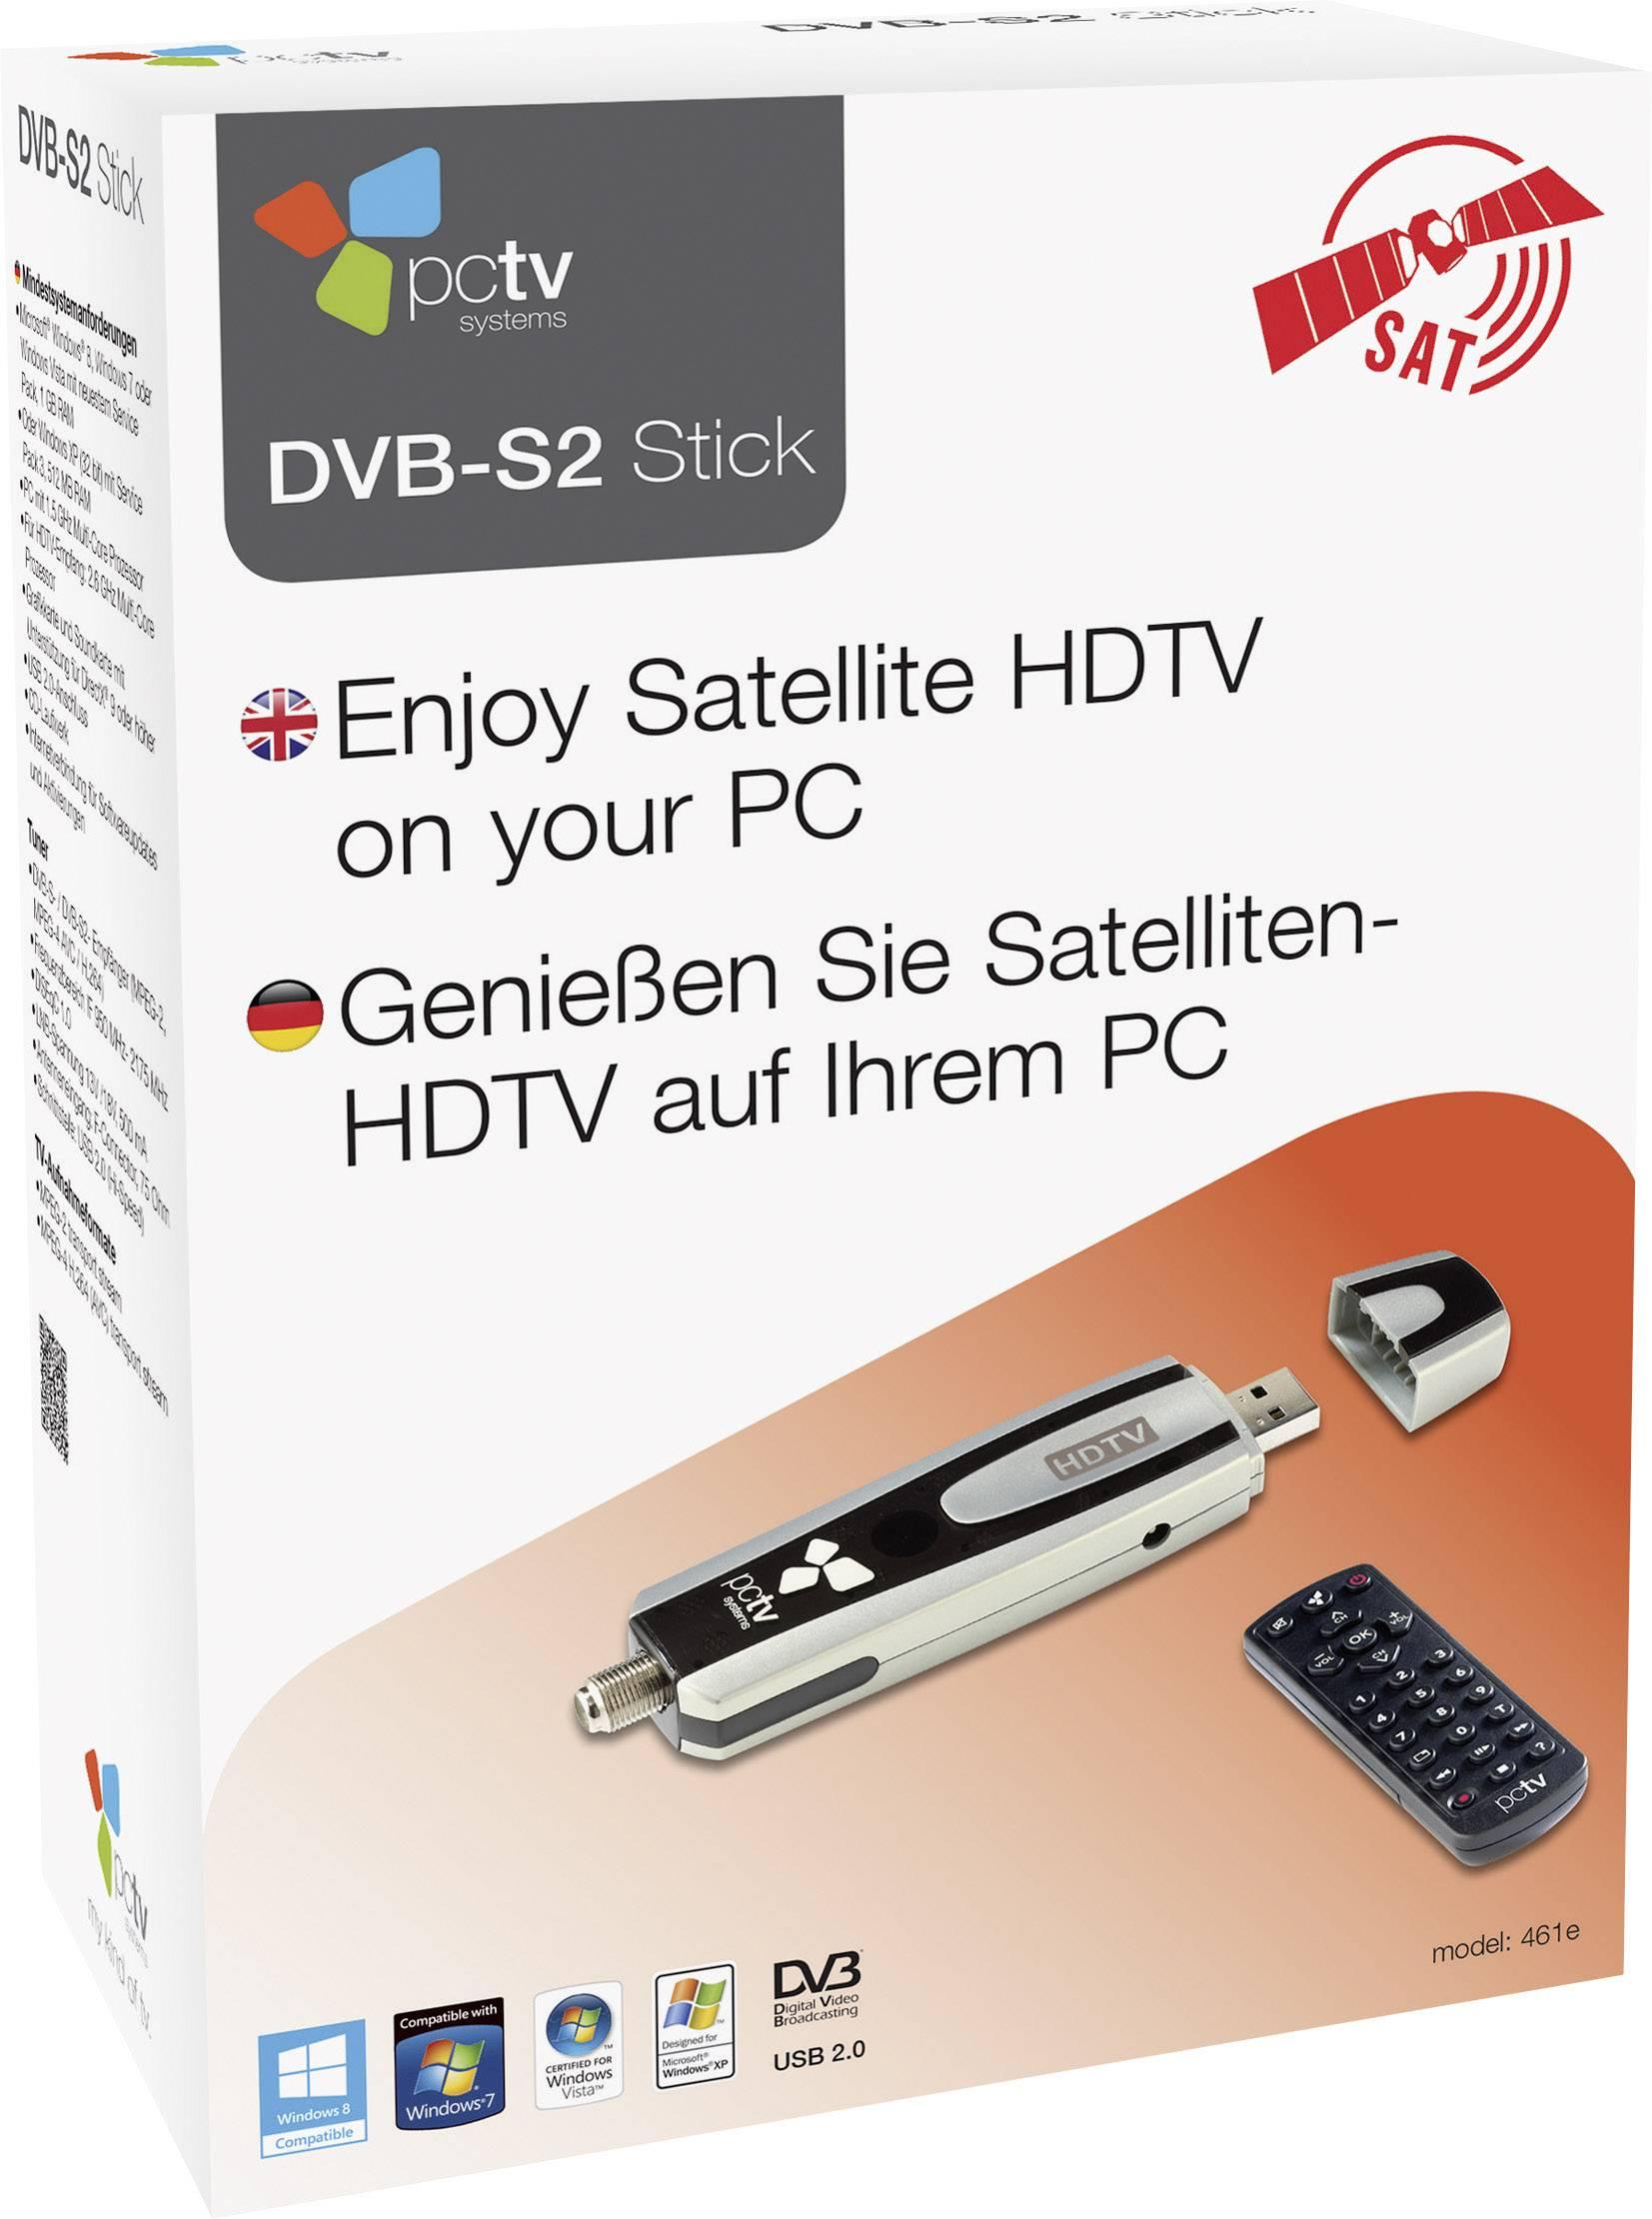 PCTV Systems 300i TV Tuner Windows 7 64-BIT